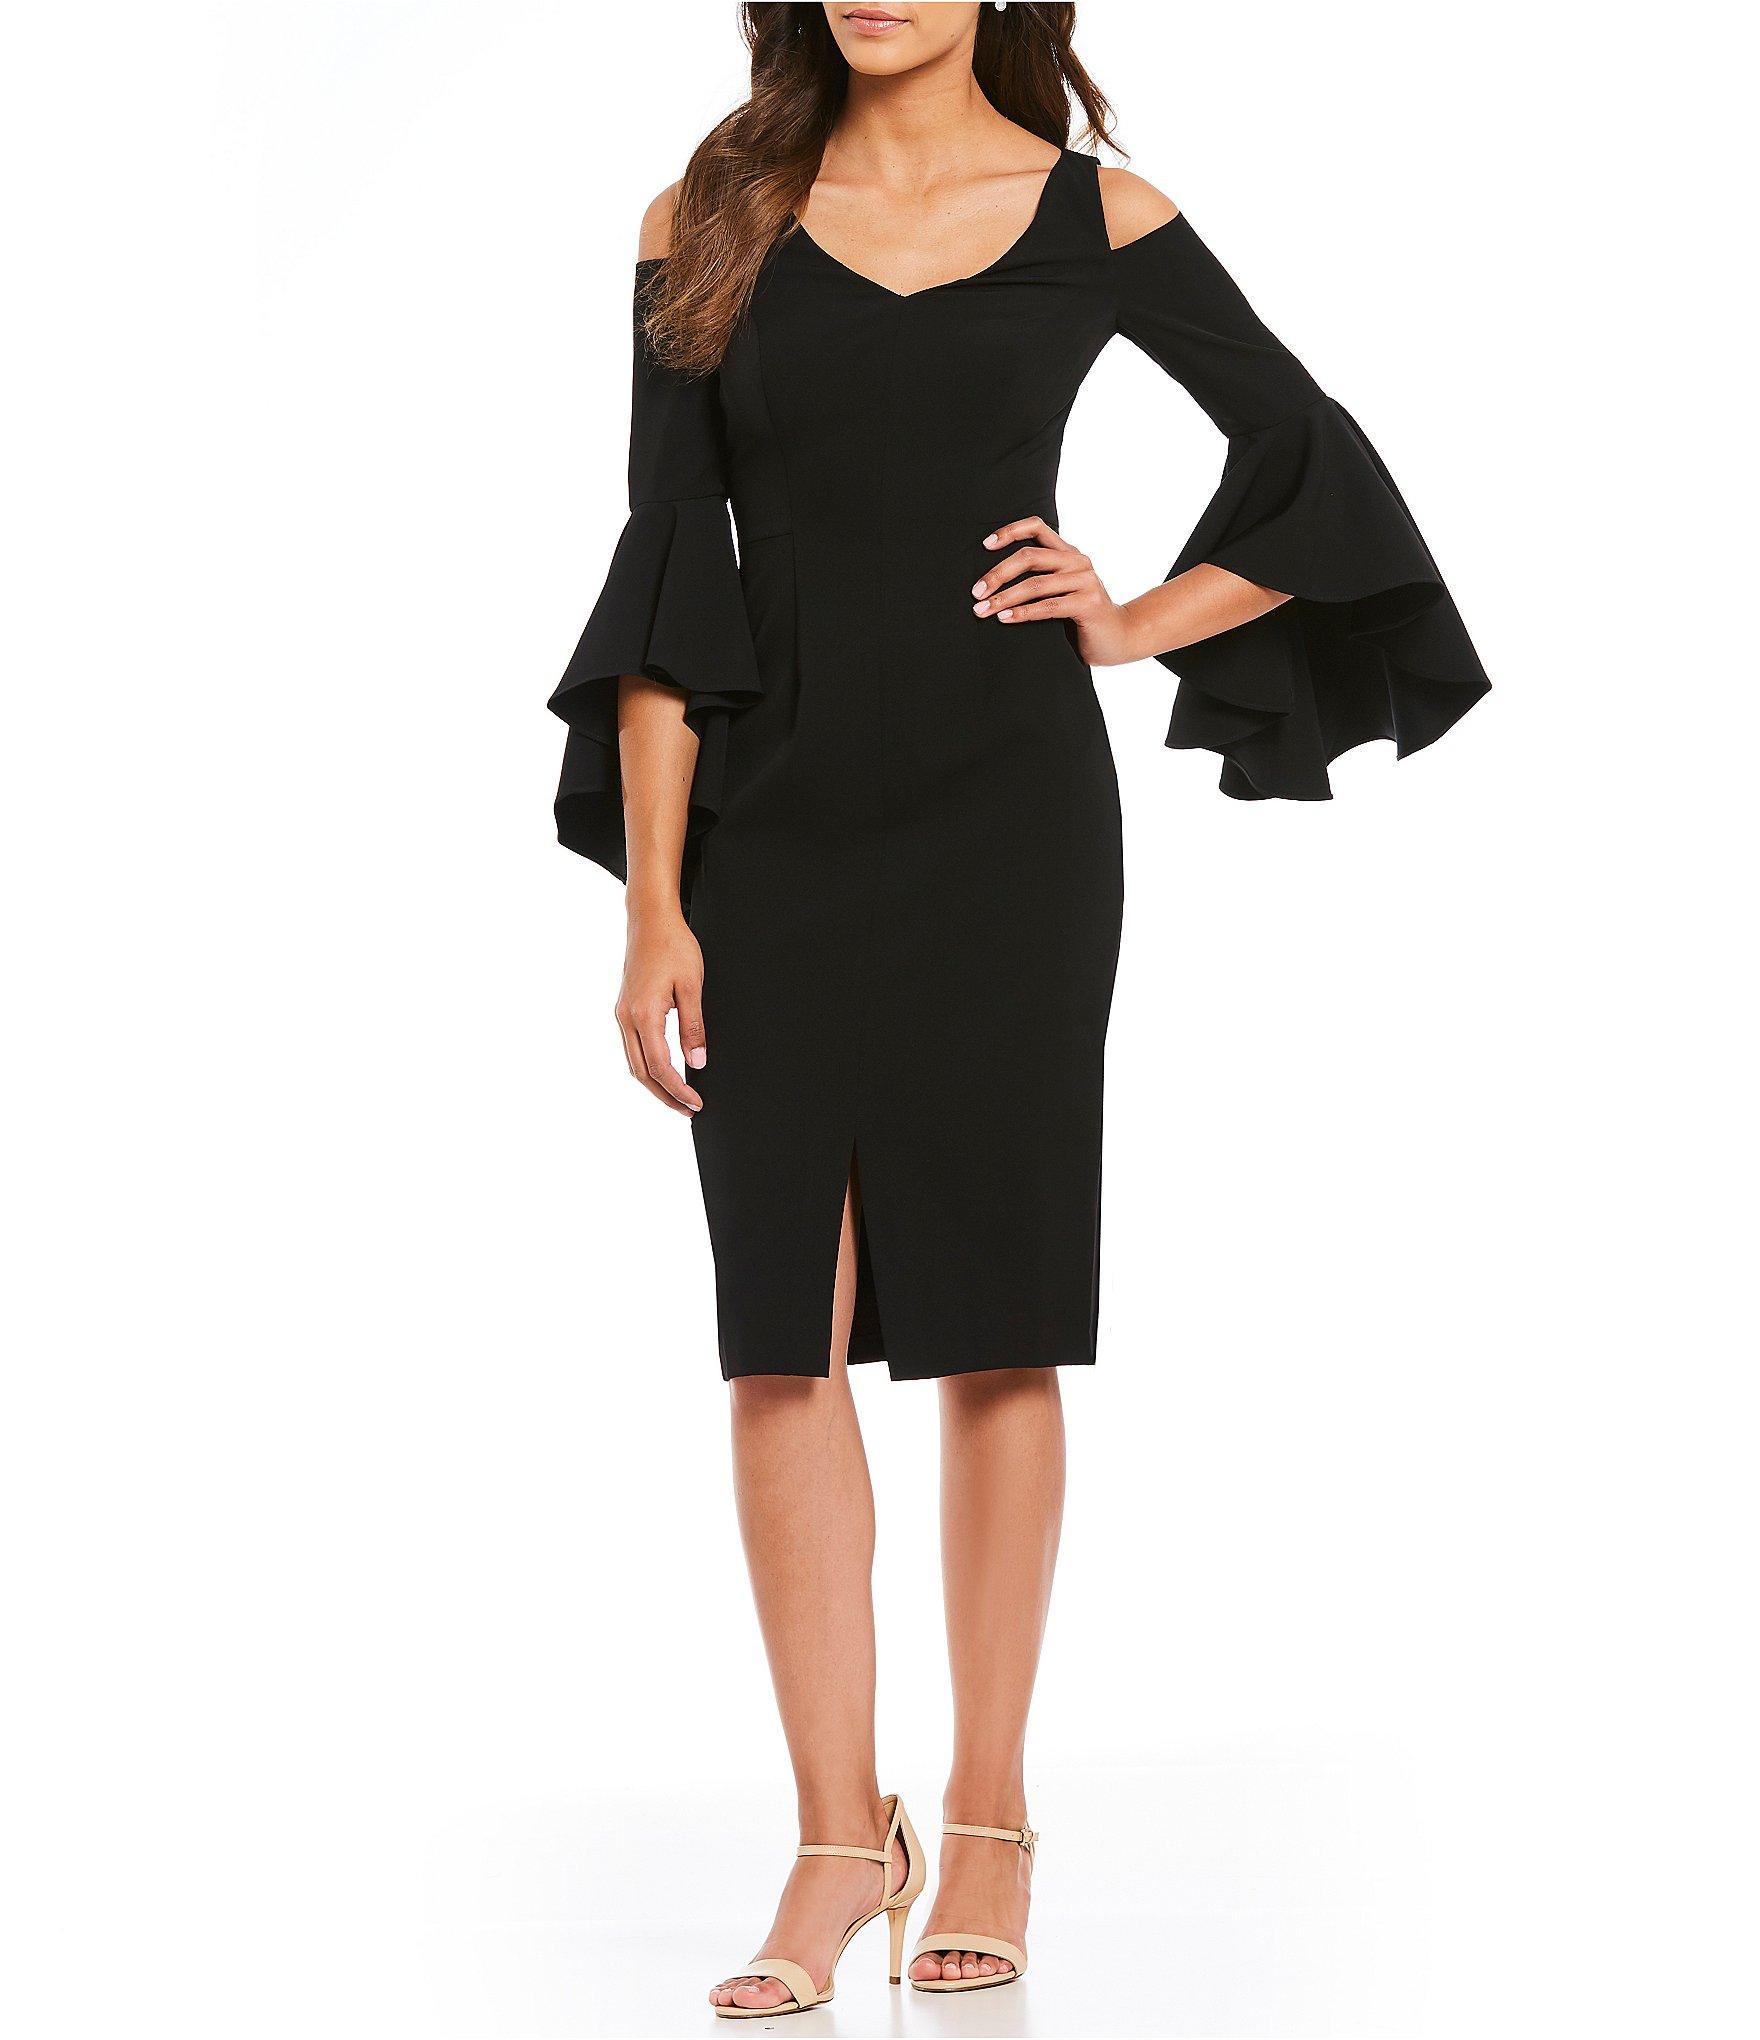 Women\'s 3/4-Sleeve Cocktail Dresses | Dillards